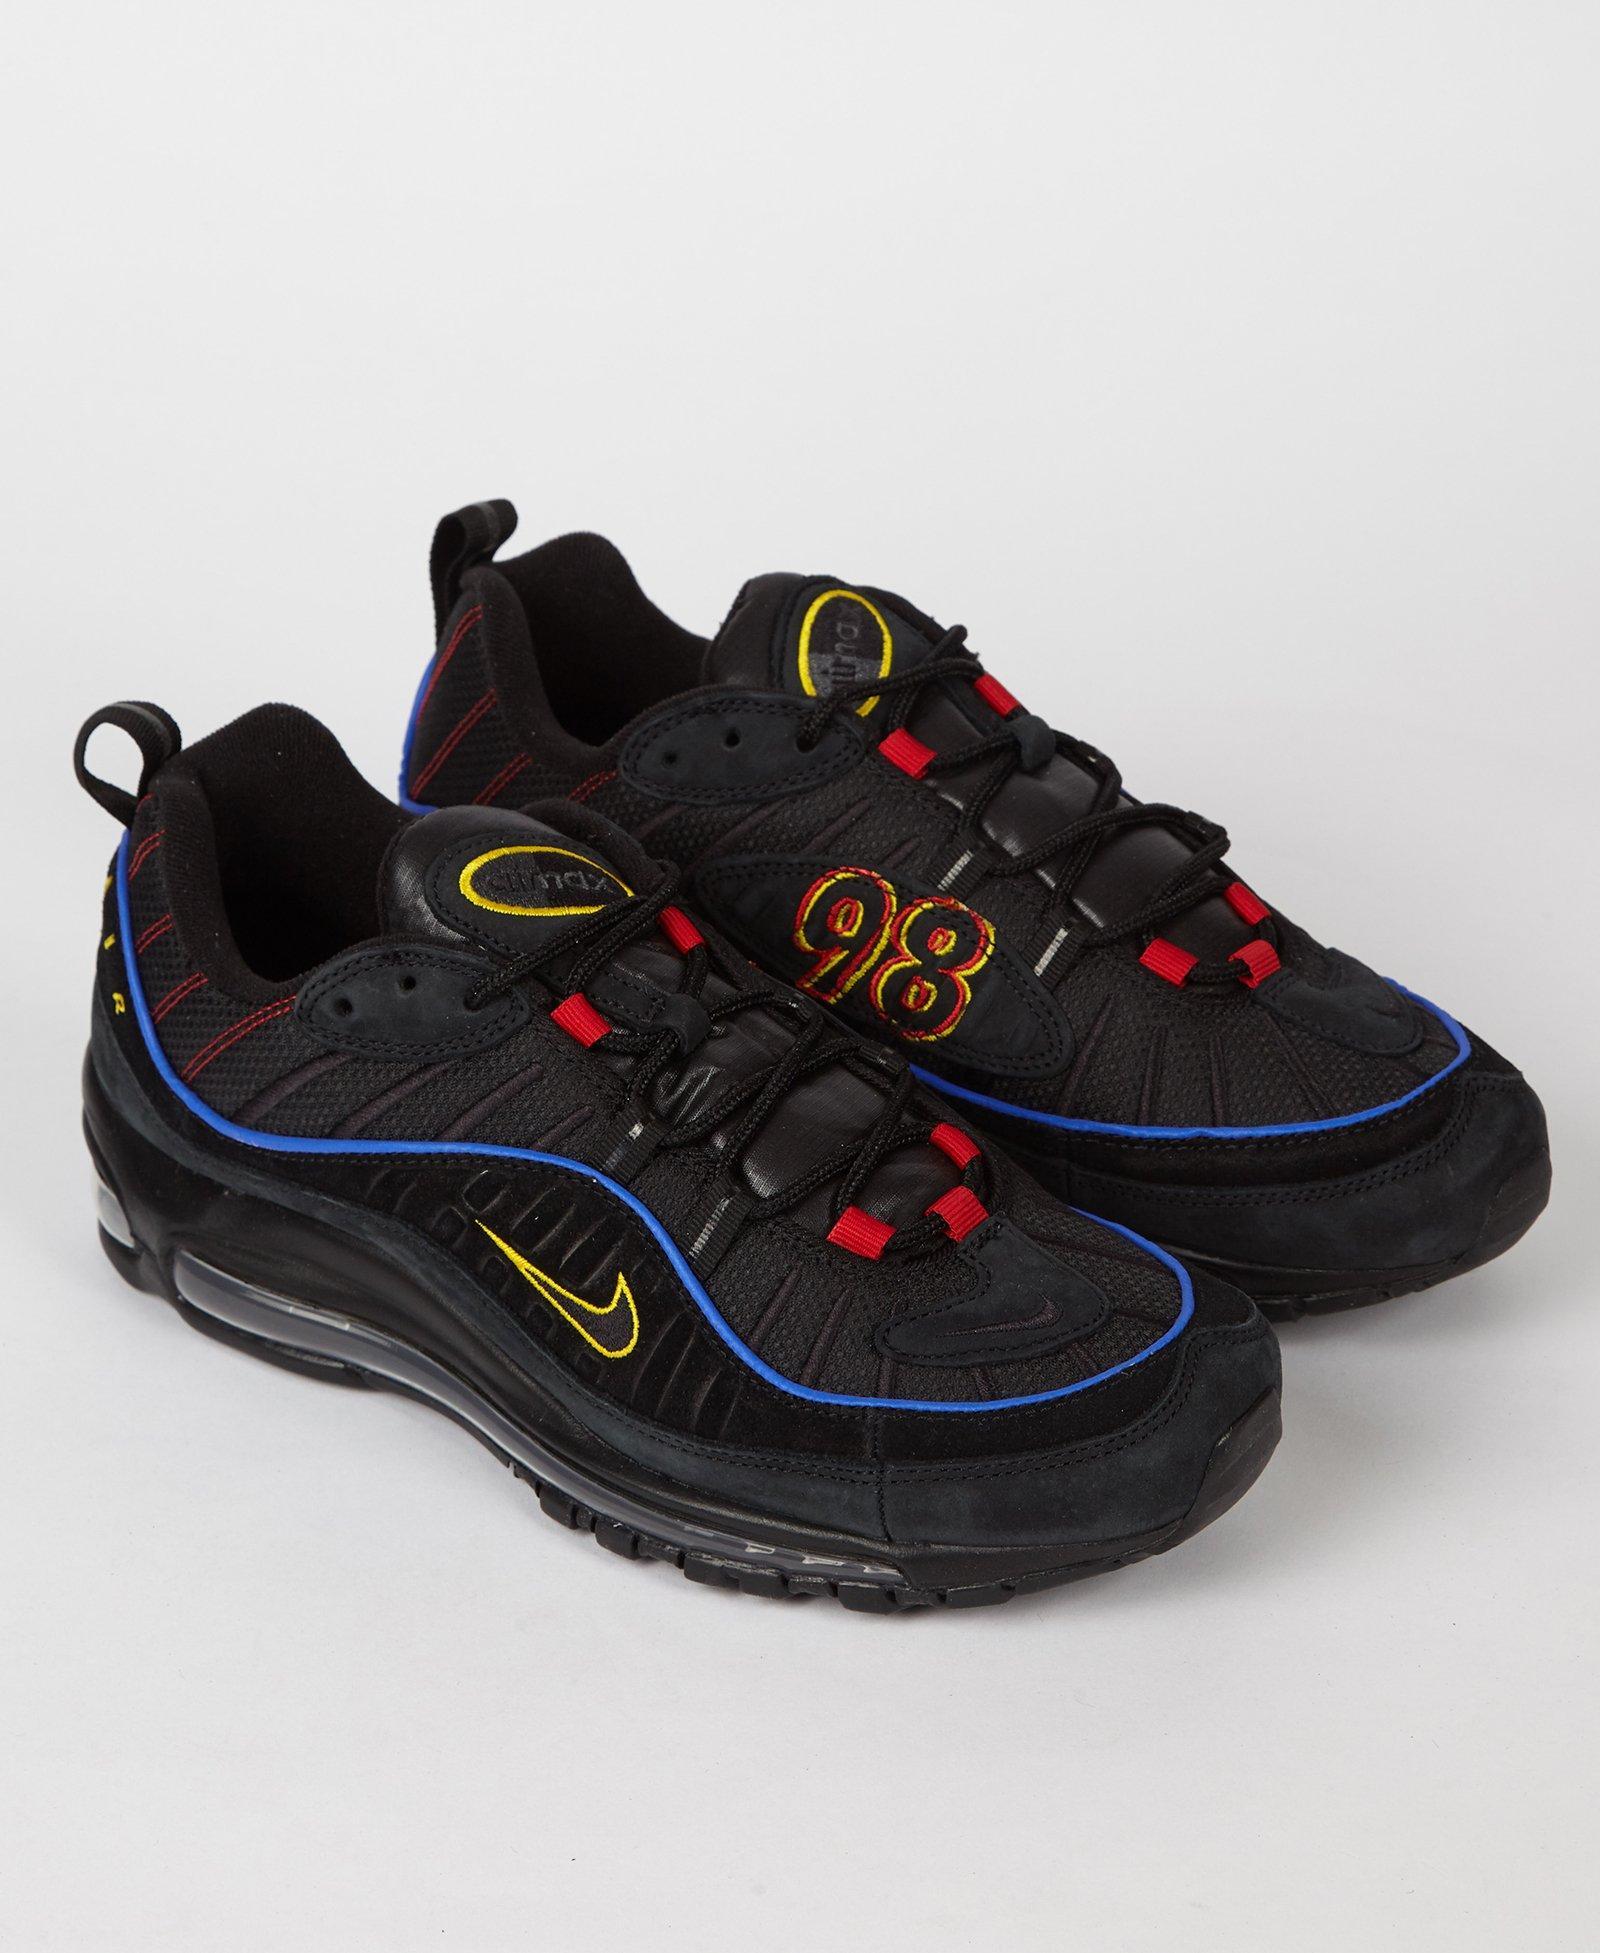 4078d76f31de Lyst - Nike Air Max 98  amarillo  in Black for Men